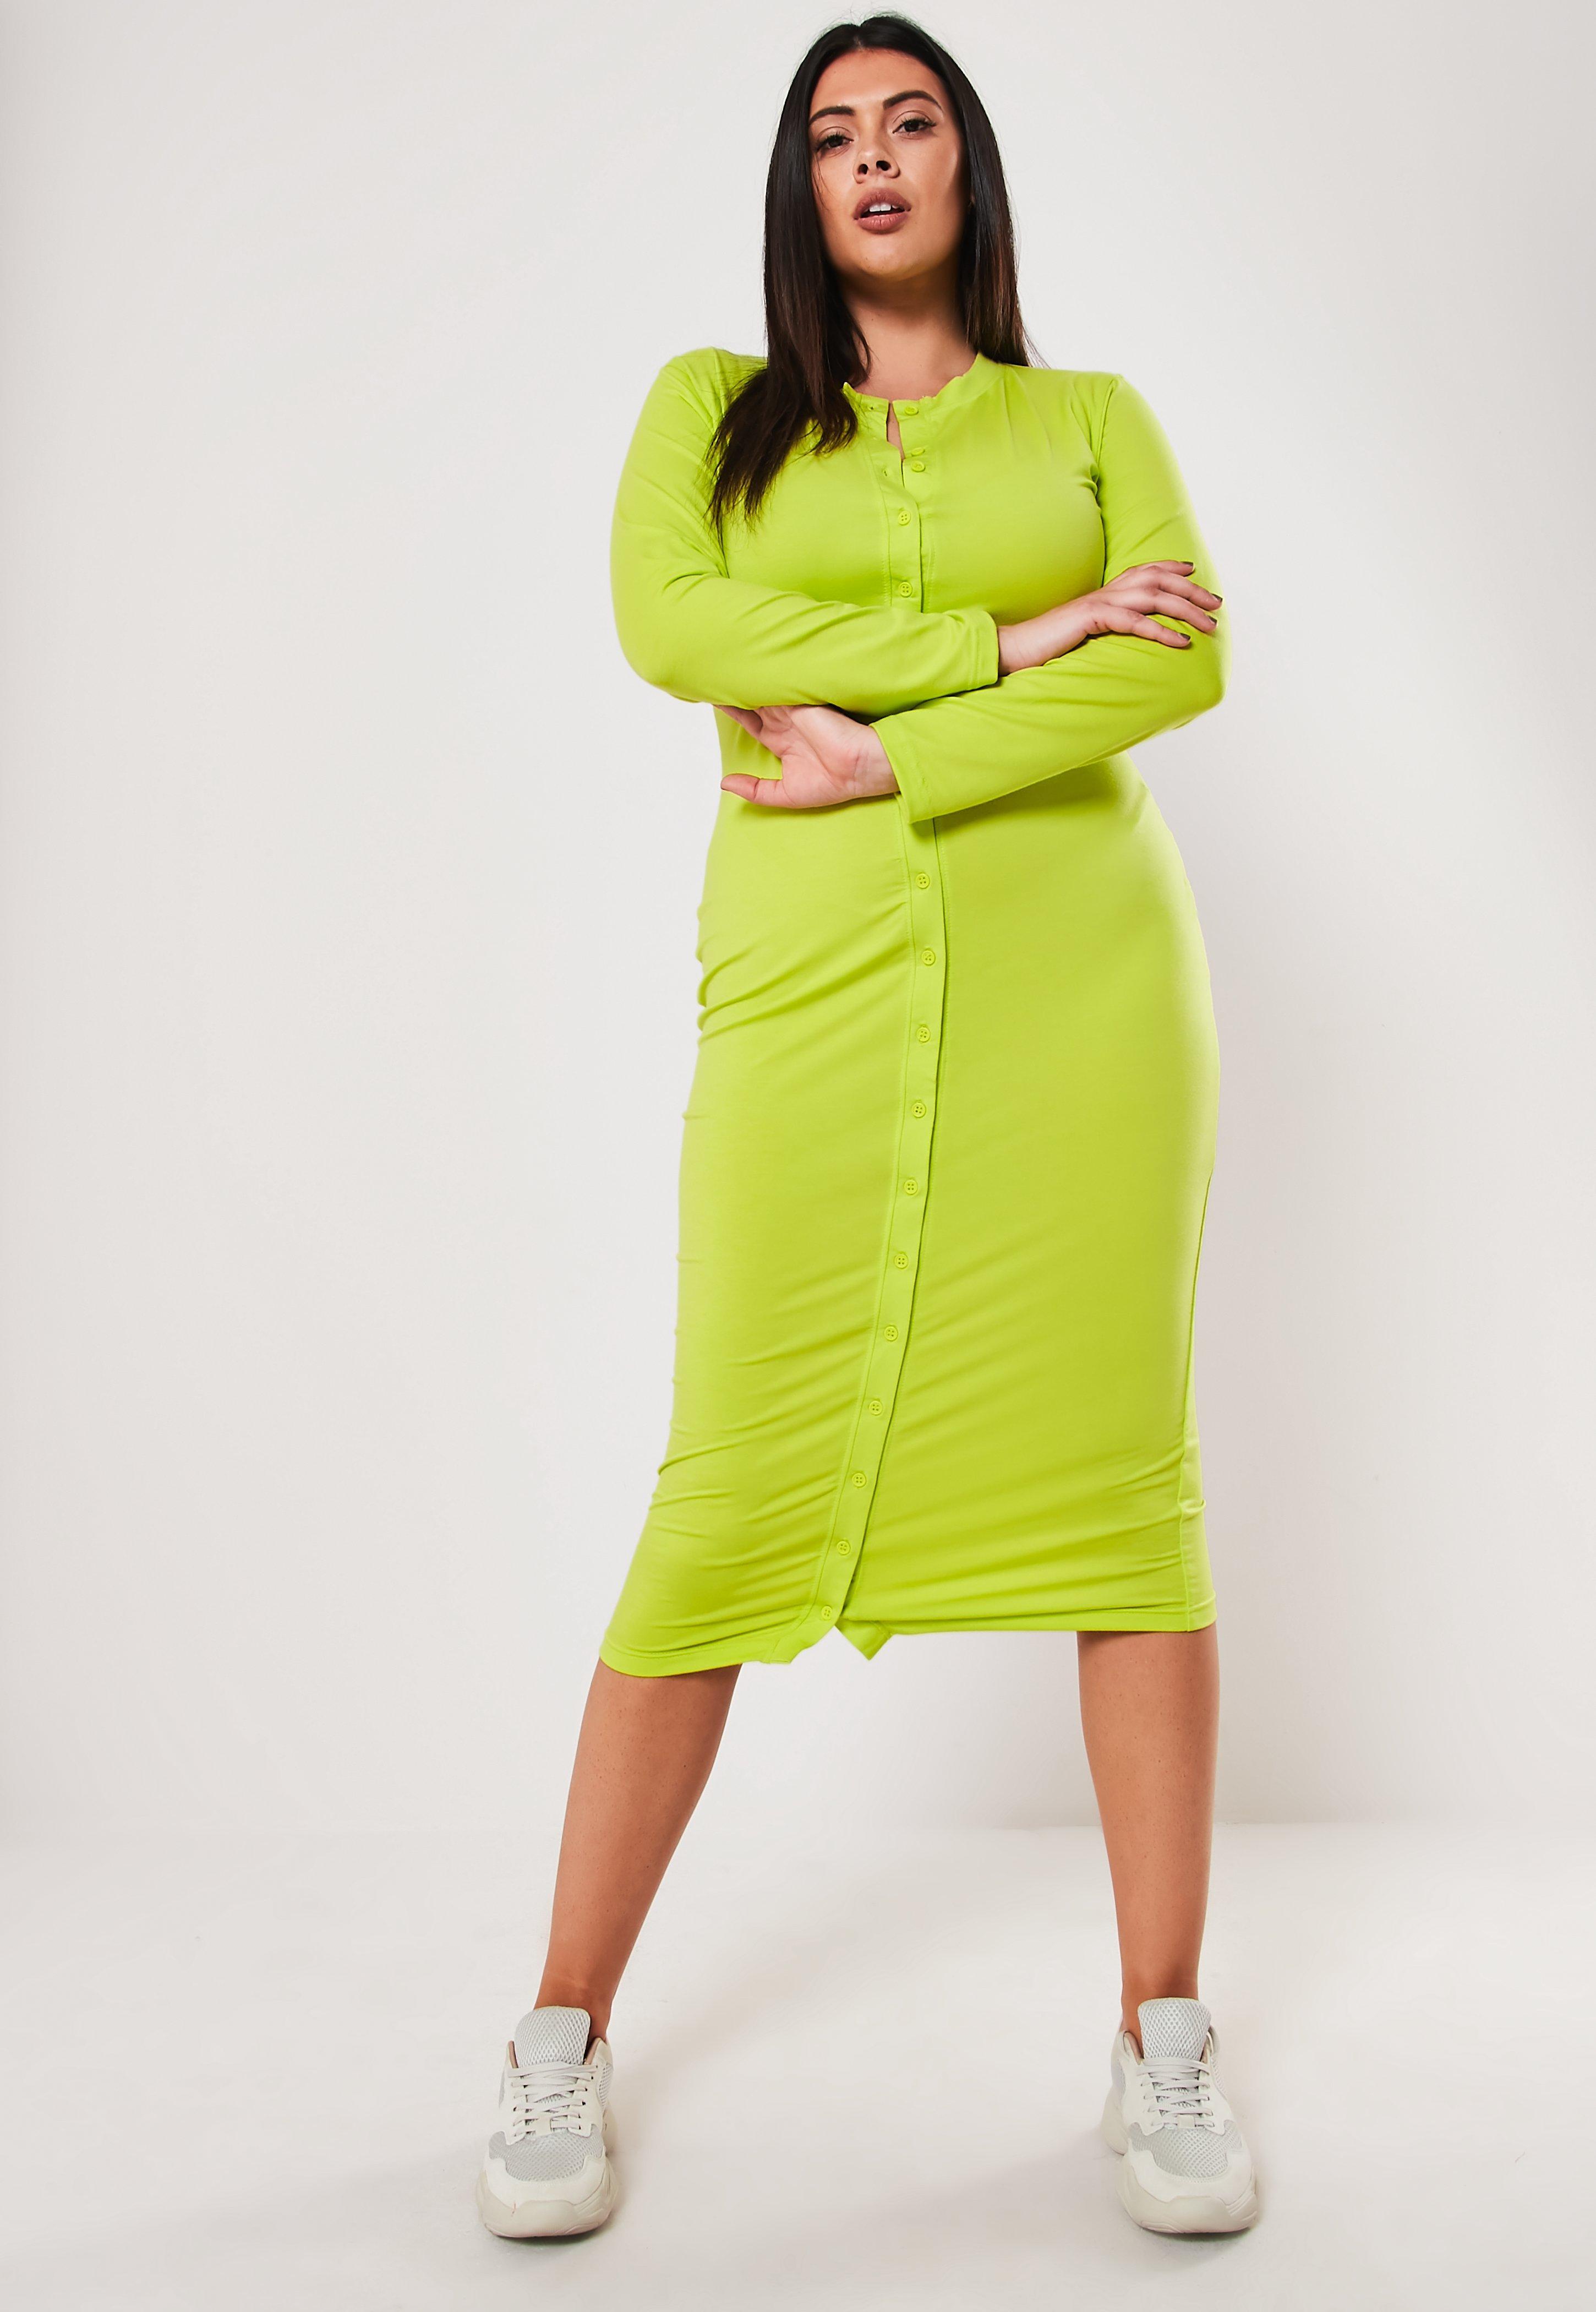 d3c724804 Plus Size Clothing & Plus Size Womens Fashion - Missguided+